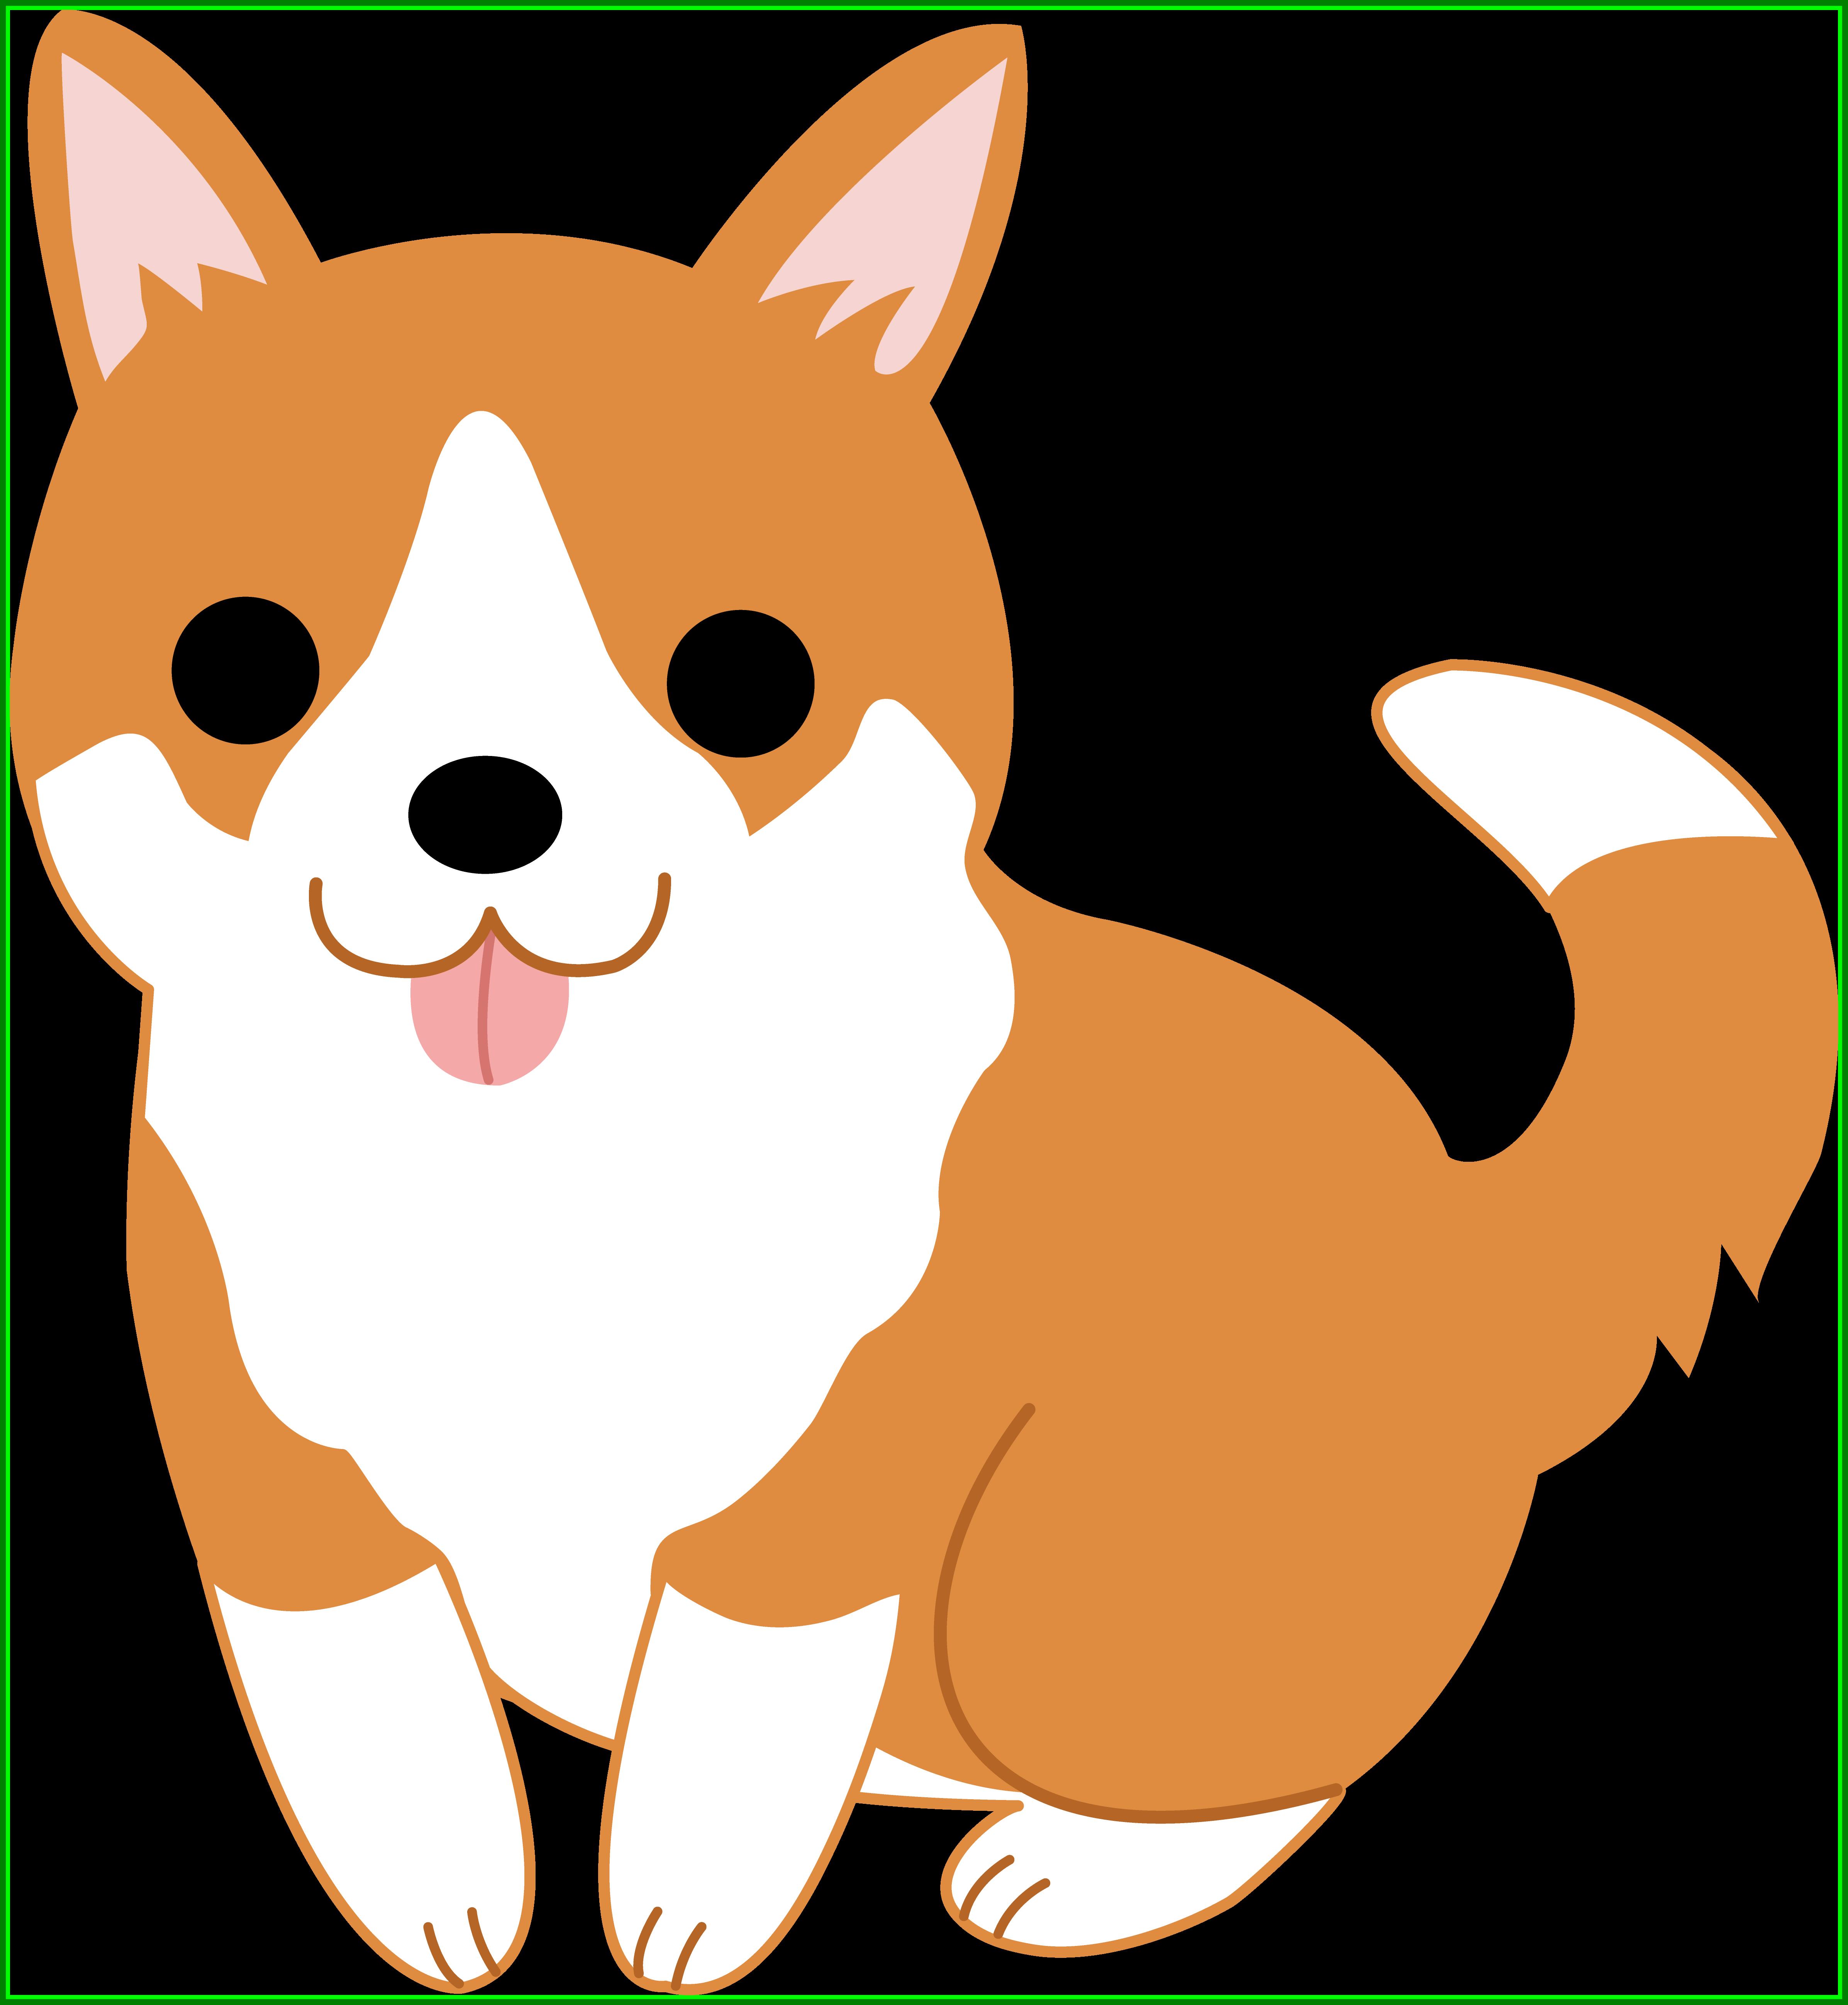 Man walking a dog clipart image transparent download 7 Ideas of Pet Dog Clipart - All Pet Animals image transparent download